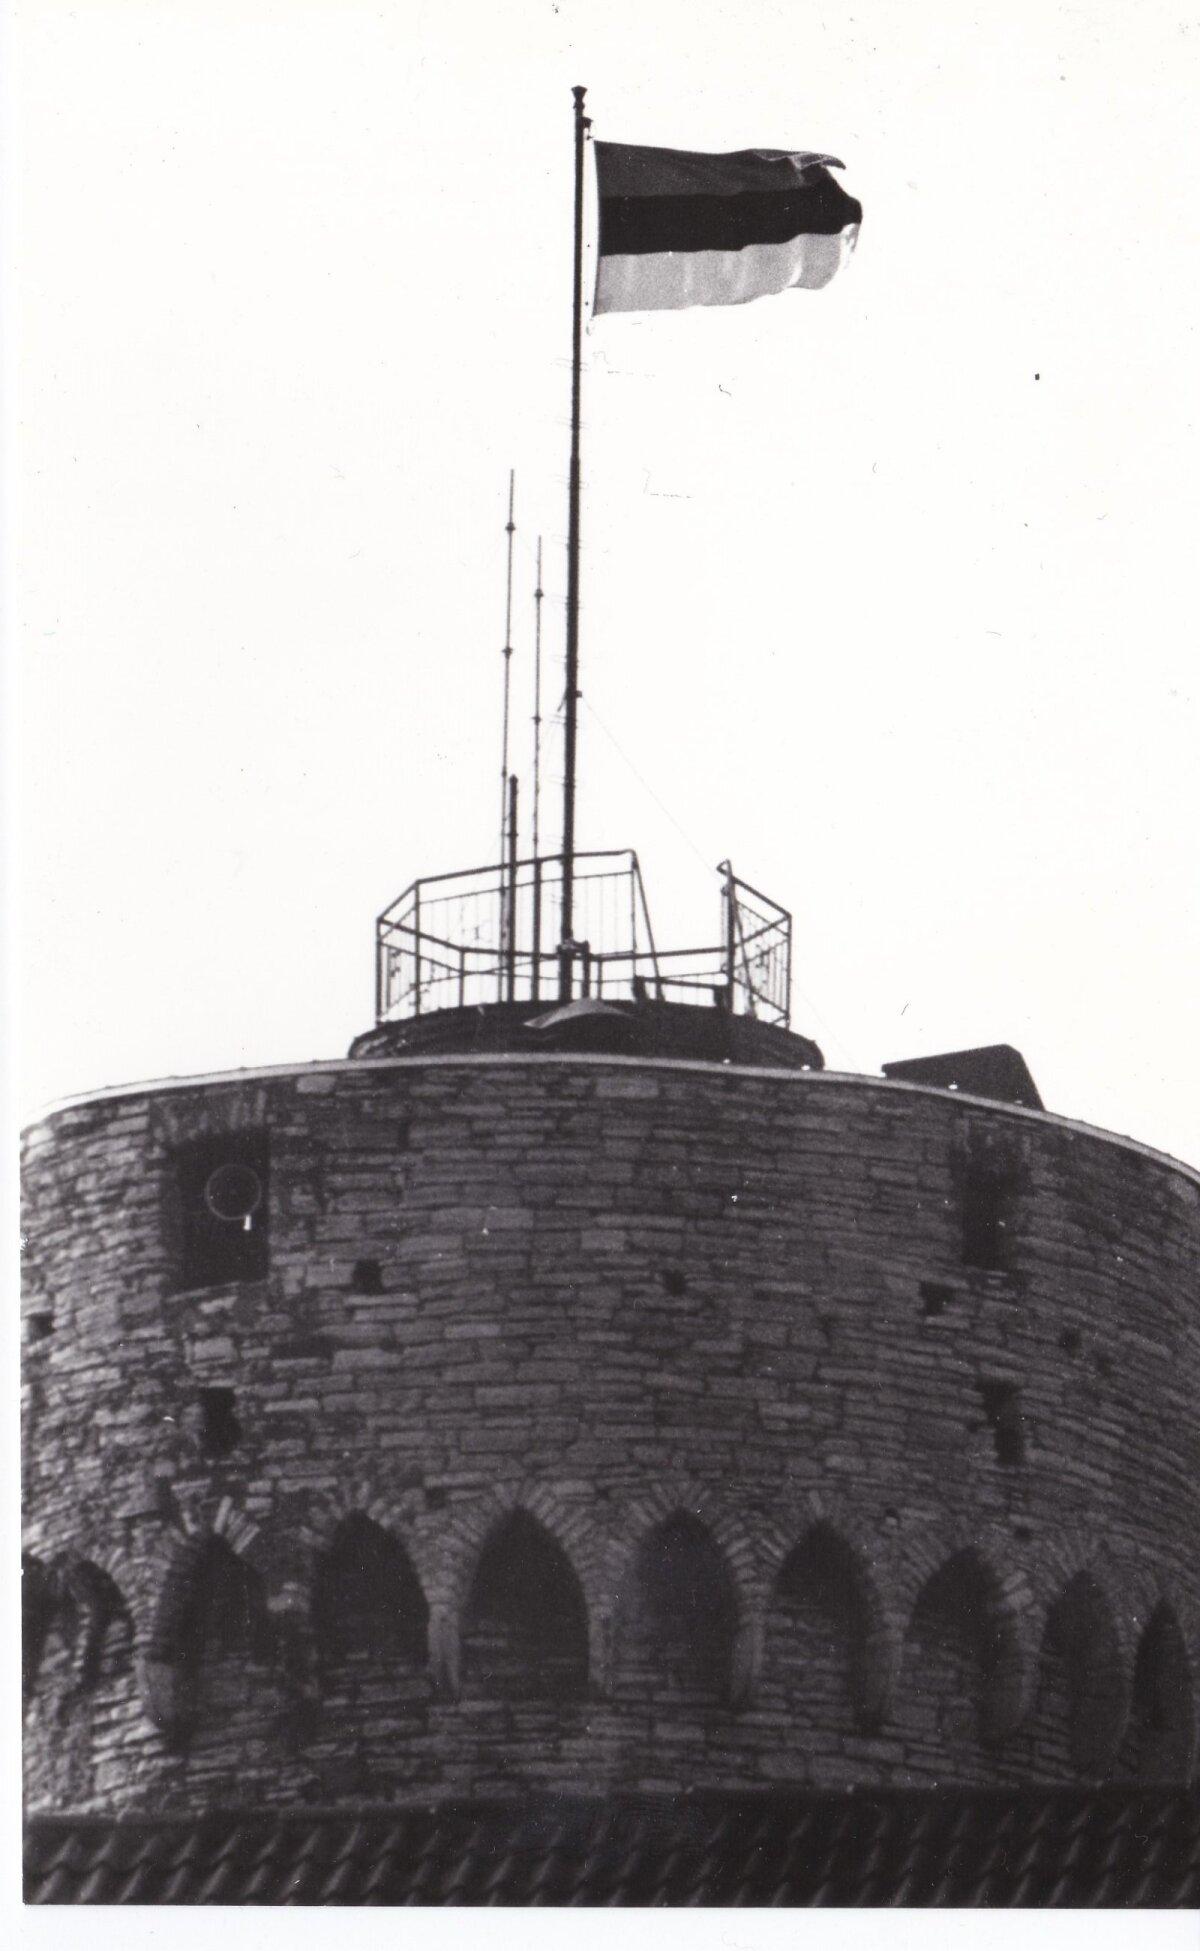 Sinimustvalge Toompea tornis. Foto: Raivo Ruus, 1989